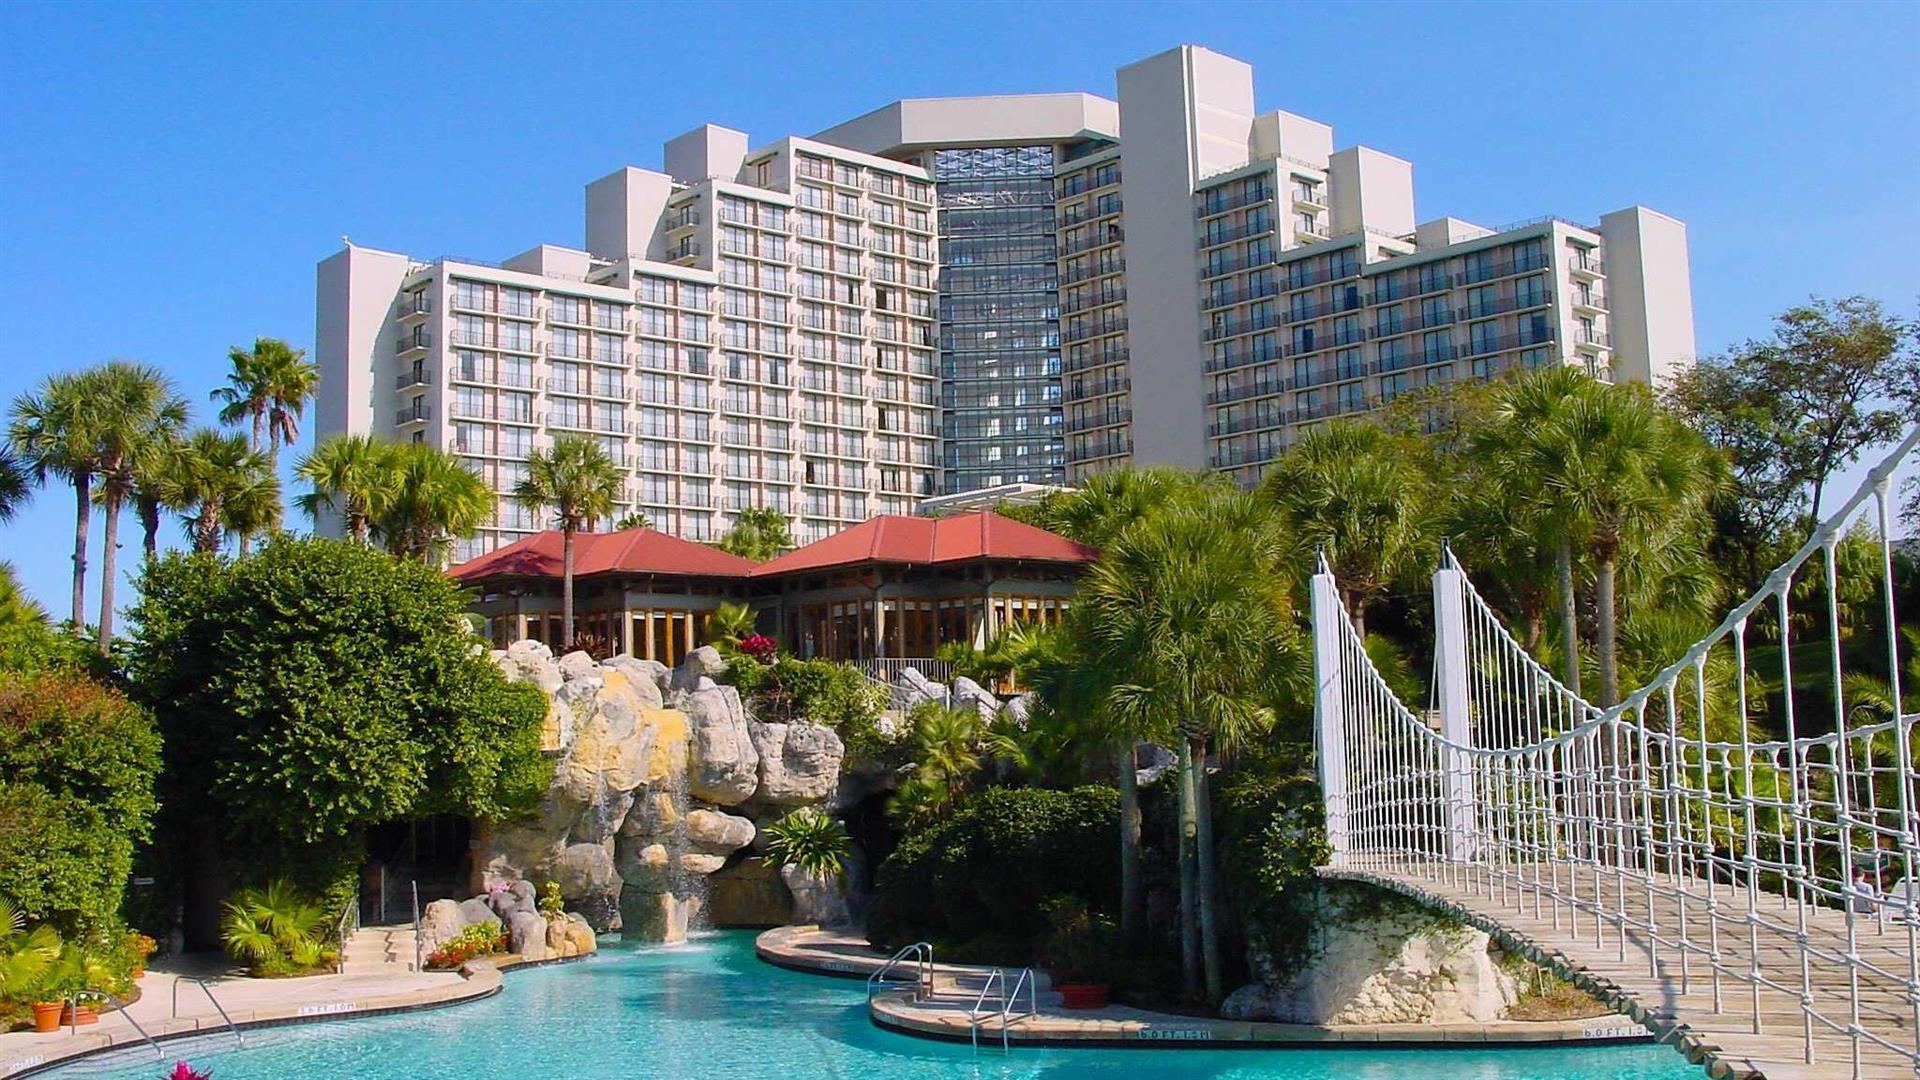 Meetings & Events at Hyatt Regency Grand Cypress Orlando FL US